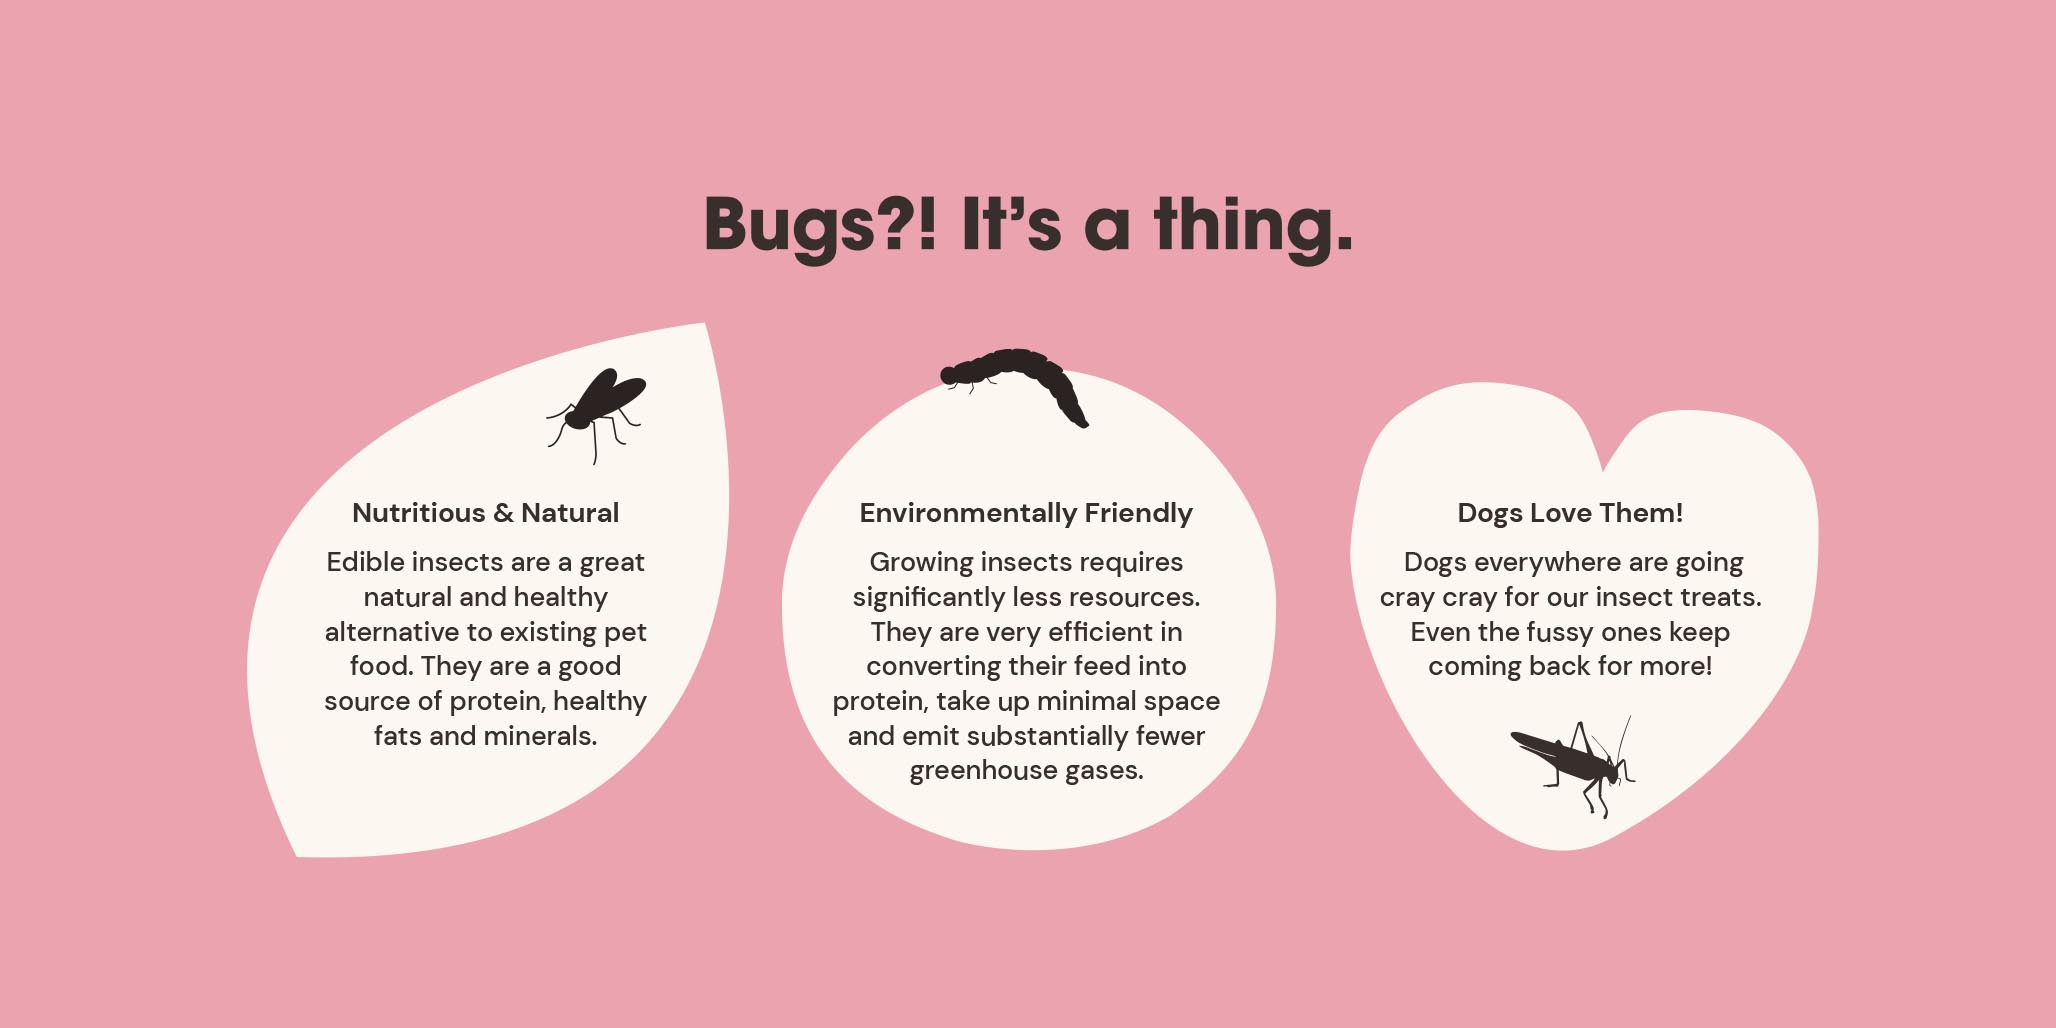 Website Design project image for pet food website design by Percept creative agencies Sydney, case study image D